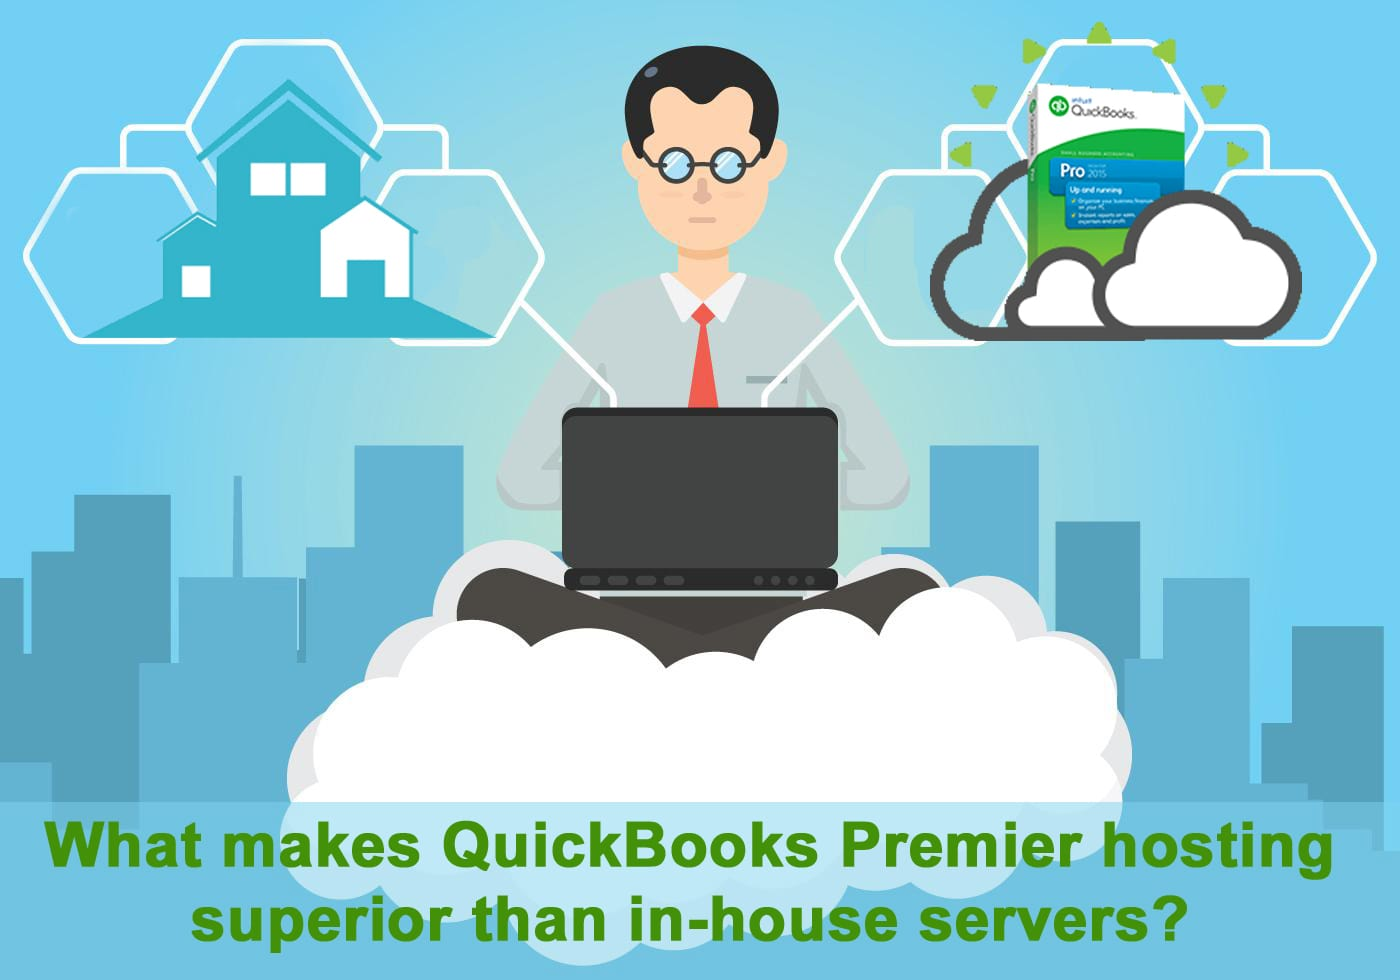 QuickBooks premier cloud hosting